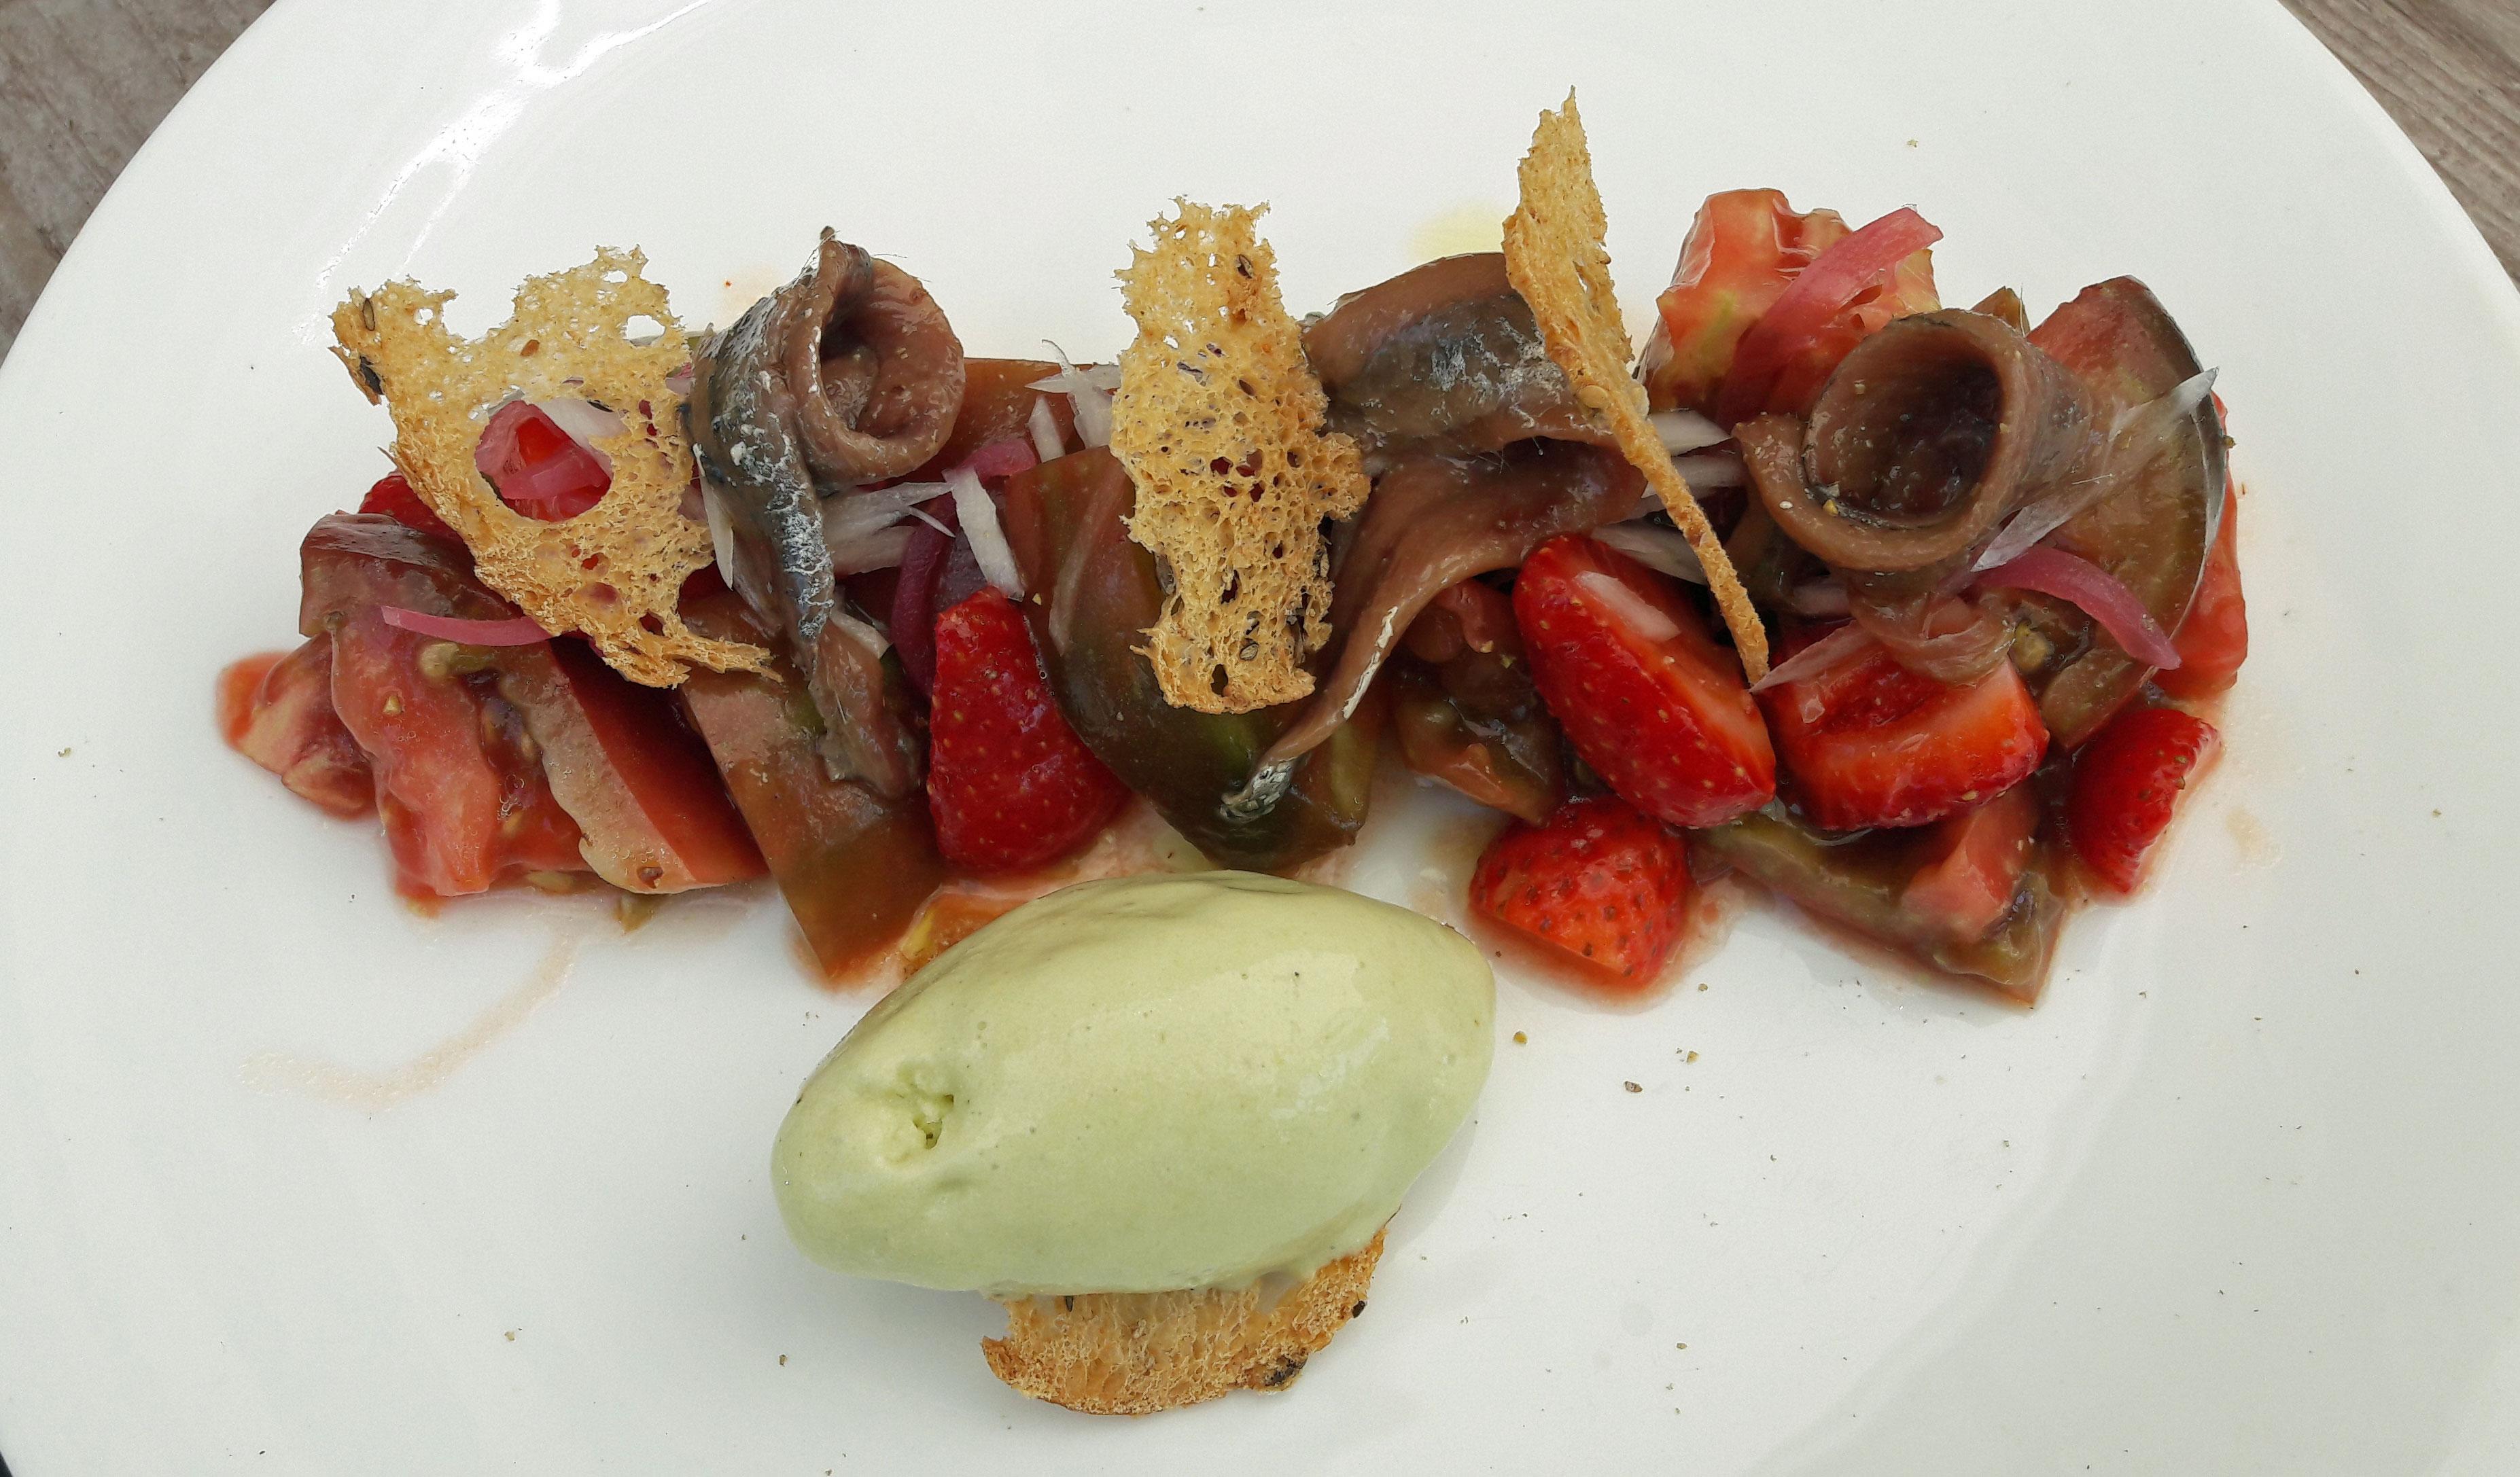 Restaurante en Barcelona Tomate con anchoas del Cantábrico, fresas y helado de queso fresco